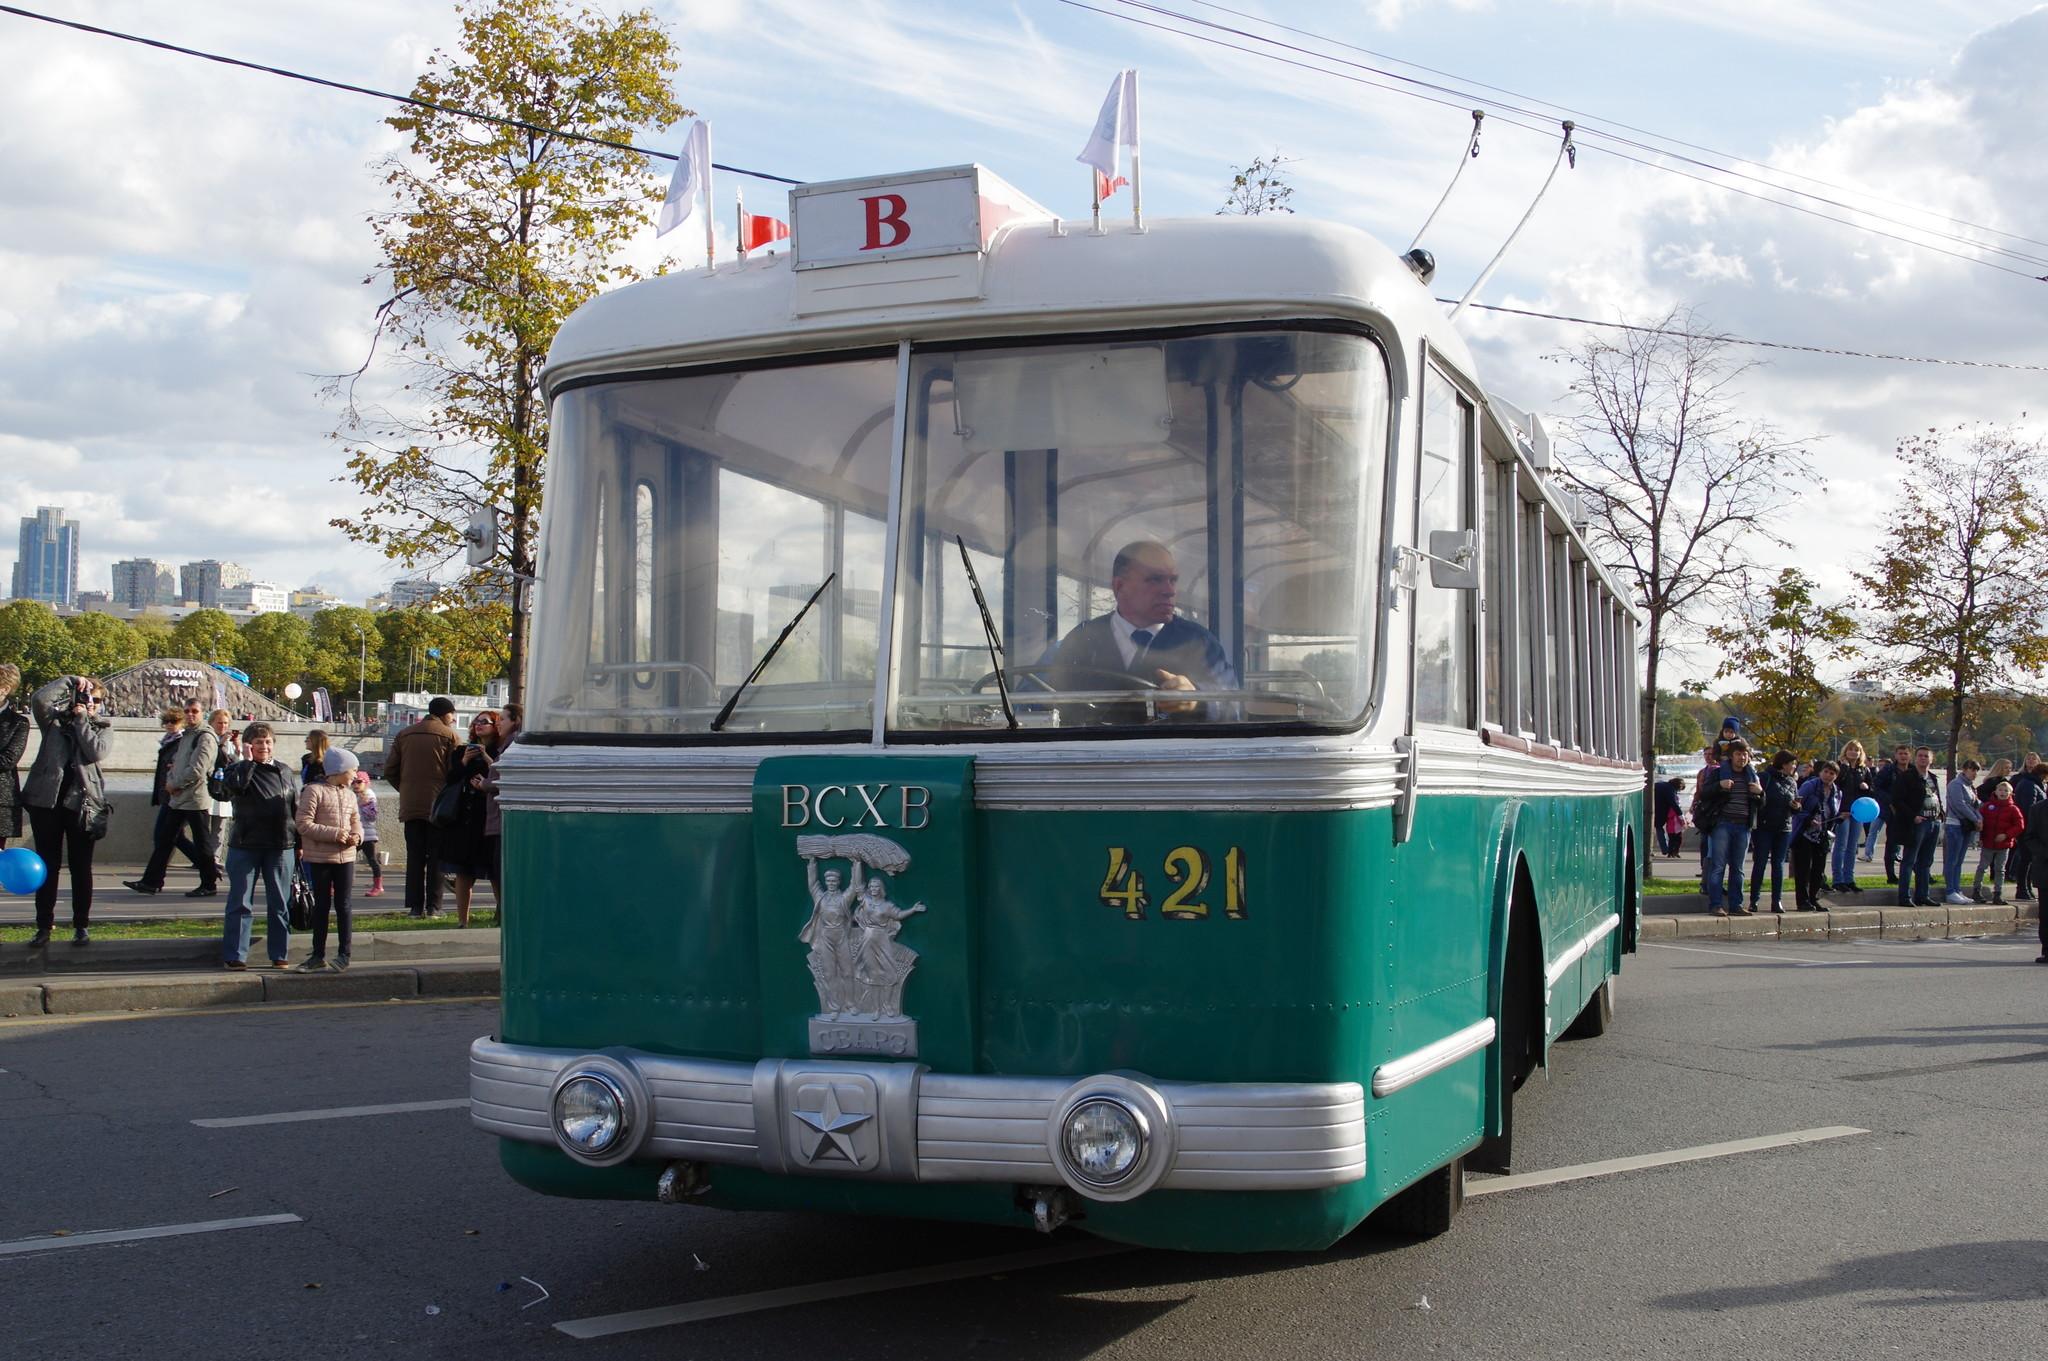 Троллейбус СВАРЗ ТБЭС-ВСХВ (1957 года выпуска)